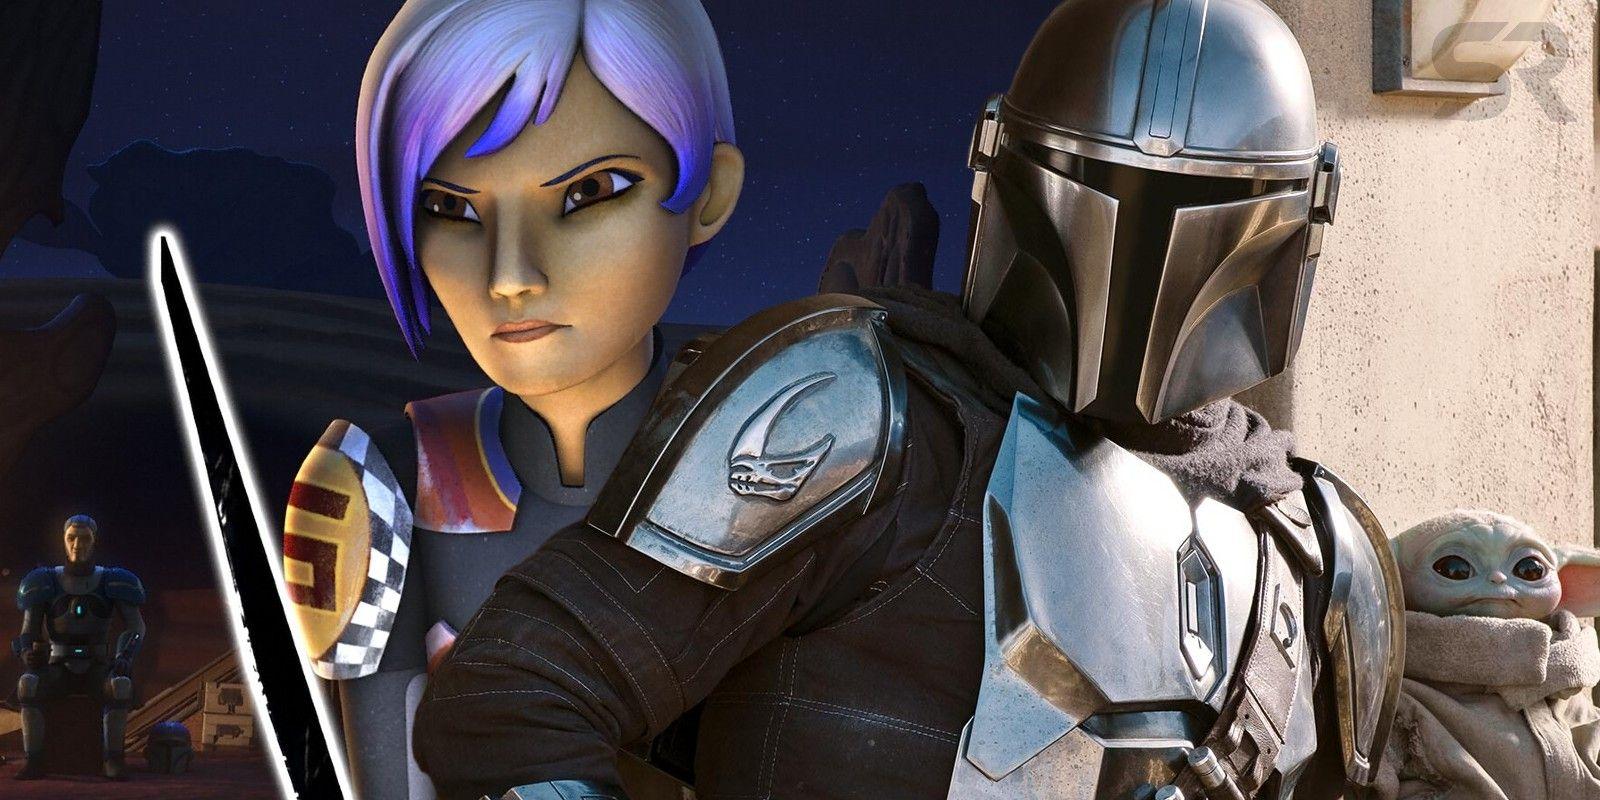 Mandalorian Theory Star Wars Rebels Sabine Is In The Season 2 Trailer